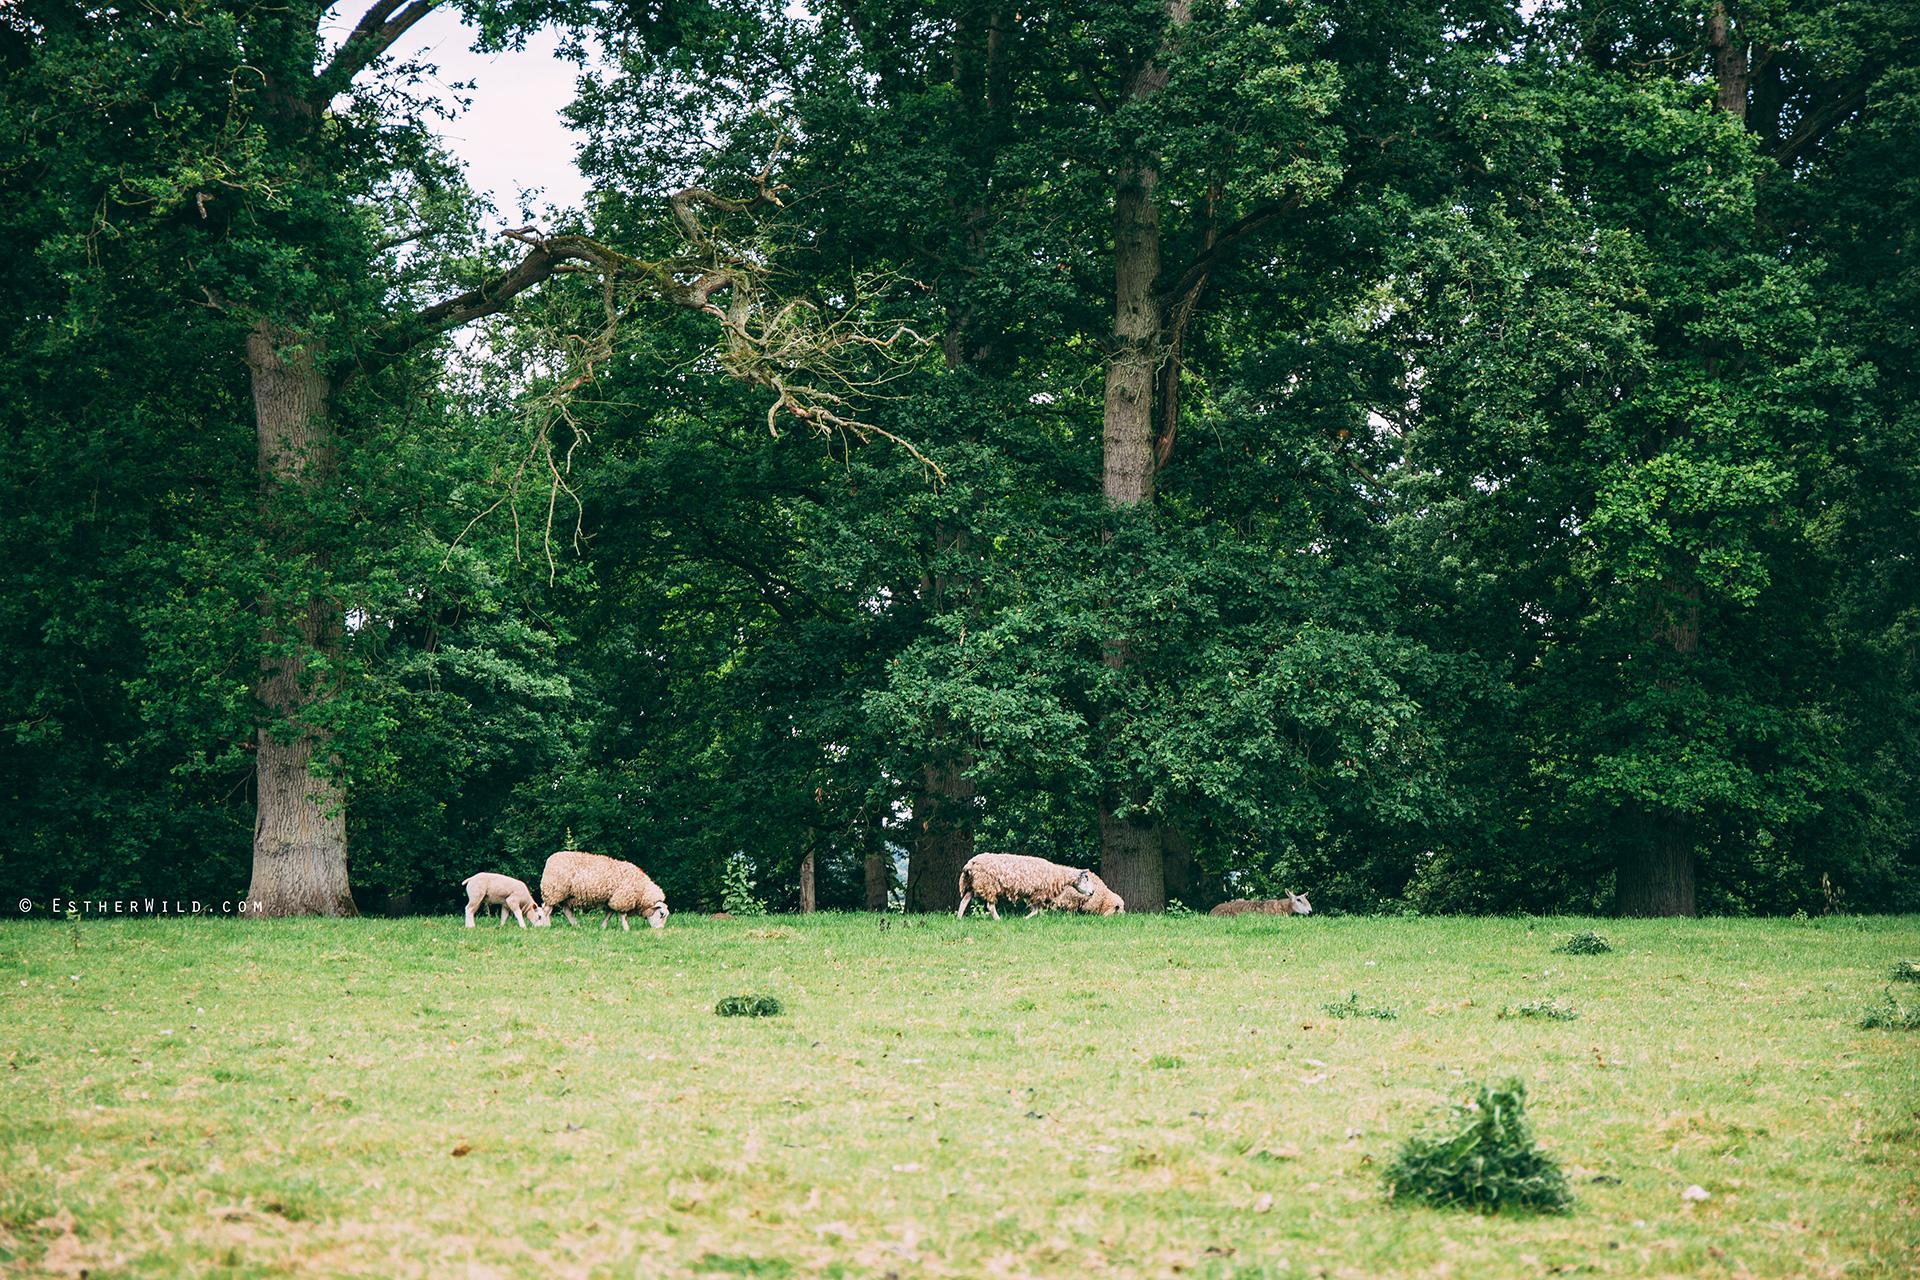 Norfolk_Wedding_Photographer_Mannington_Hall_Country_Esther_Wild_9932.jpg